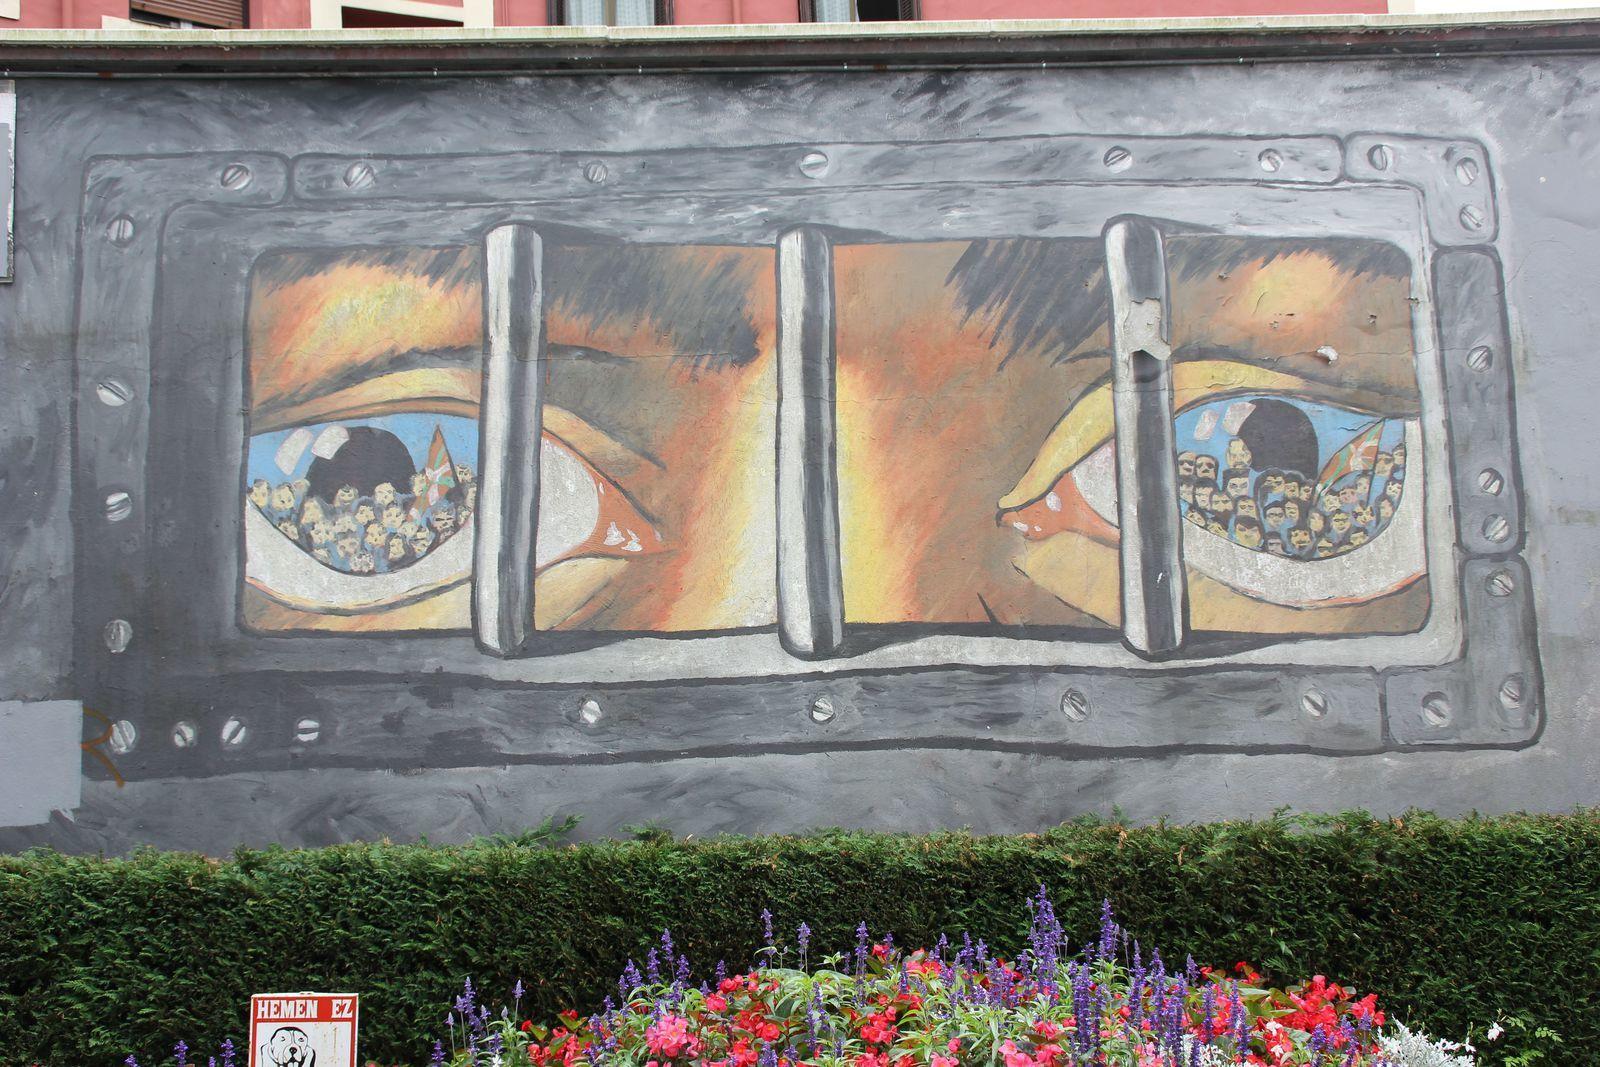 470) Beechmount Avenue, West Belfast